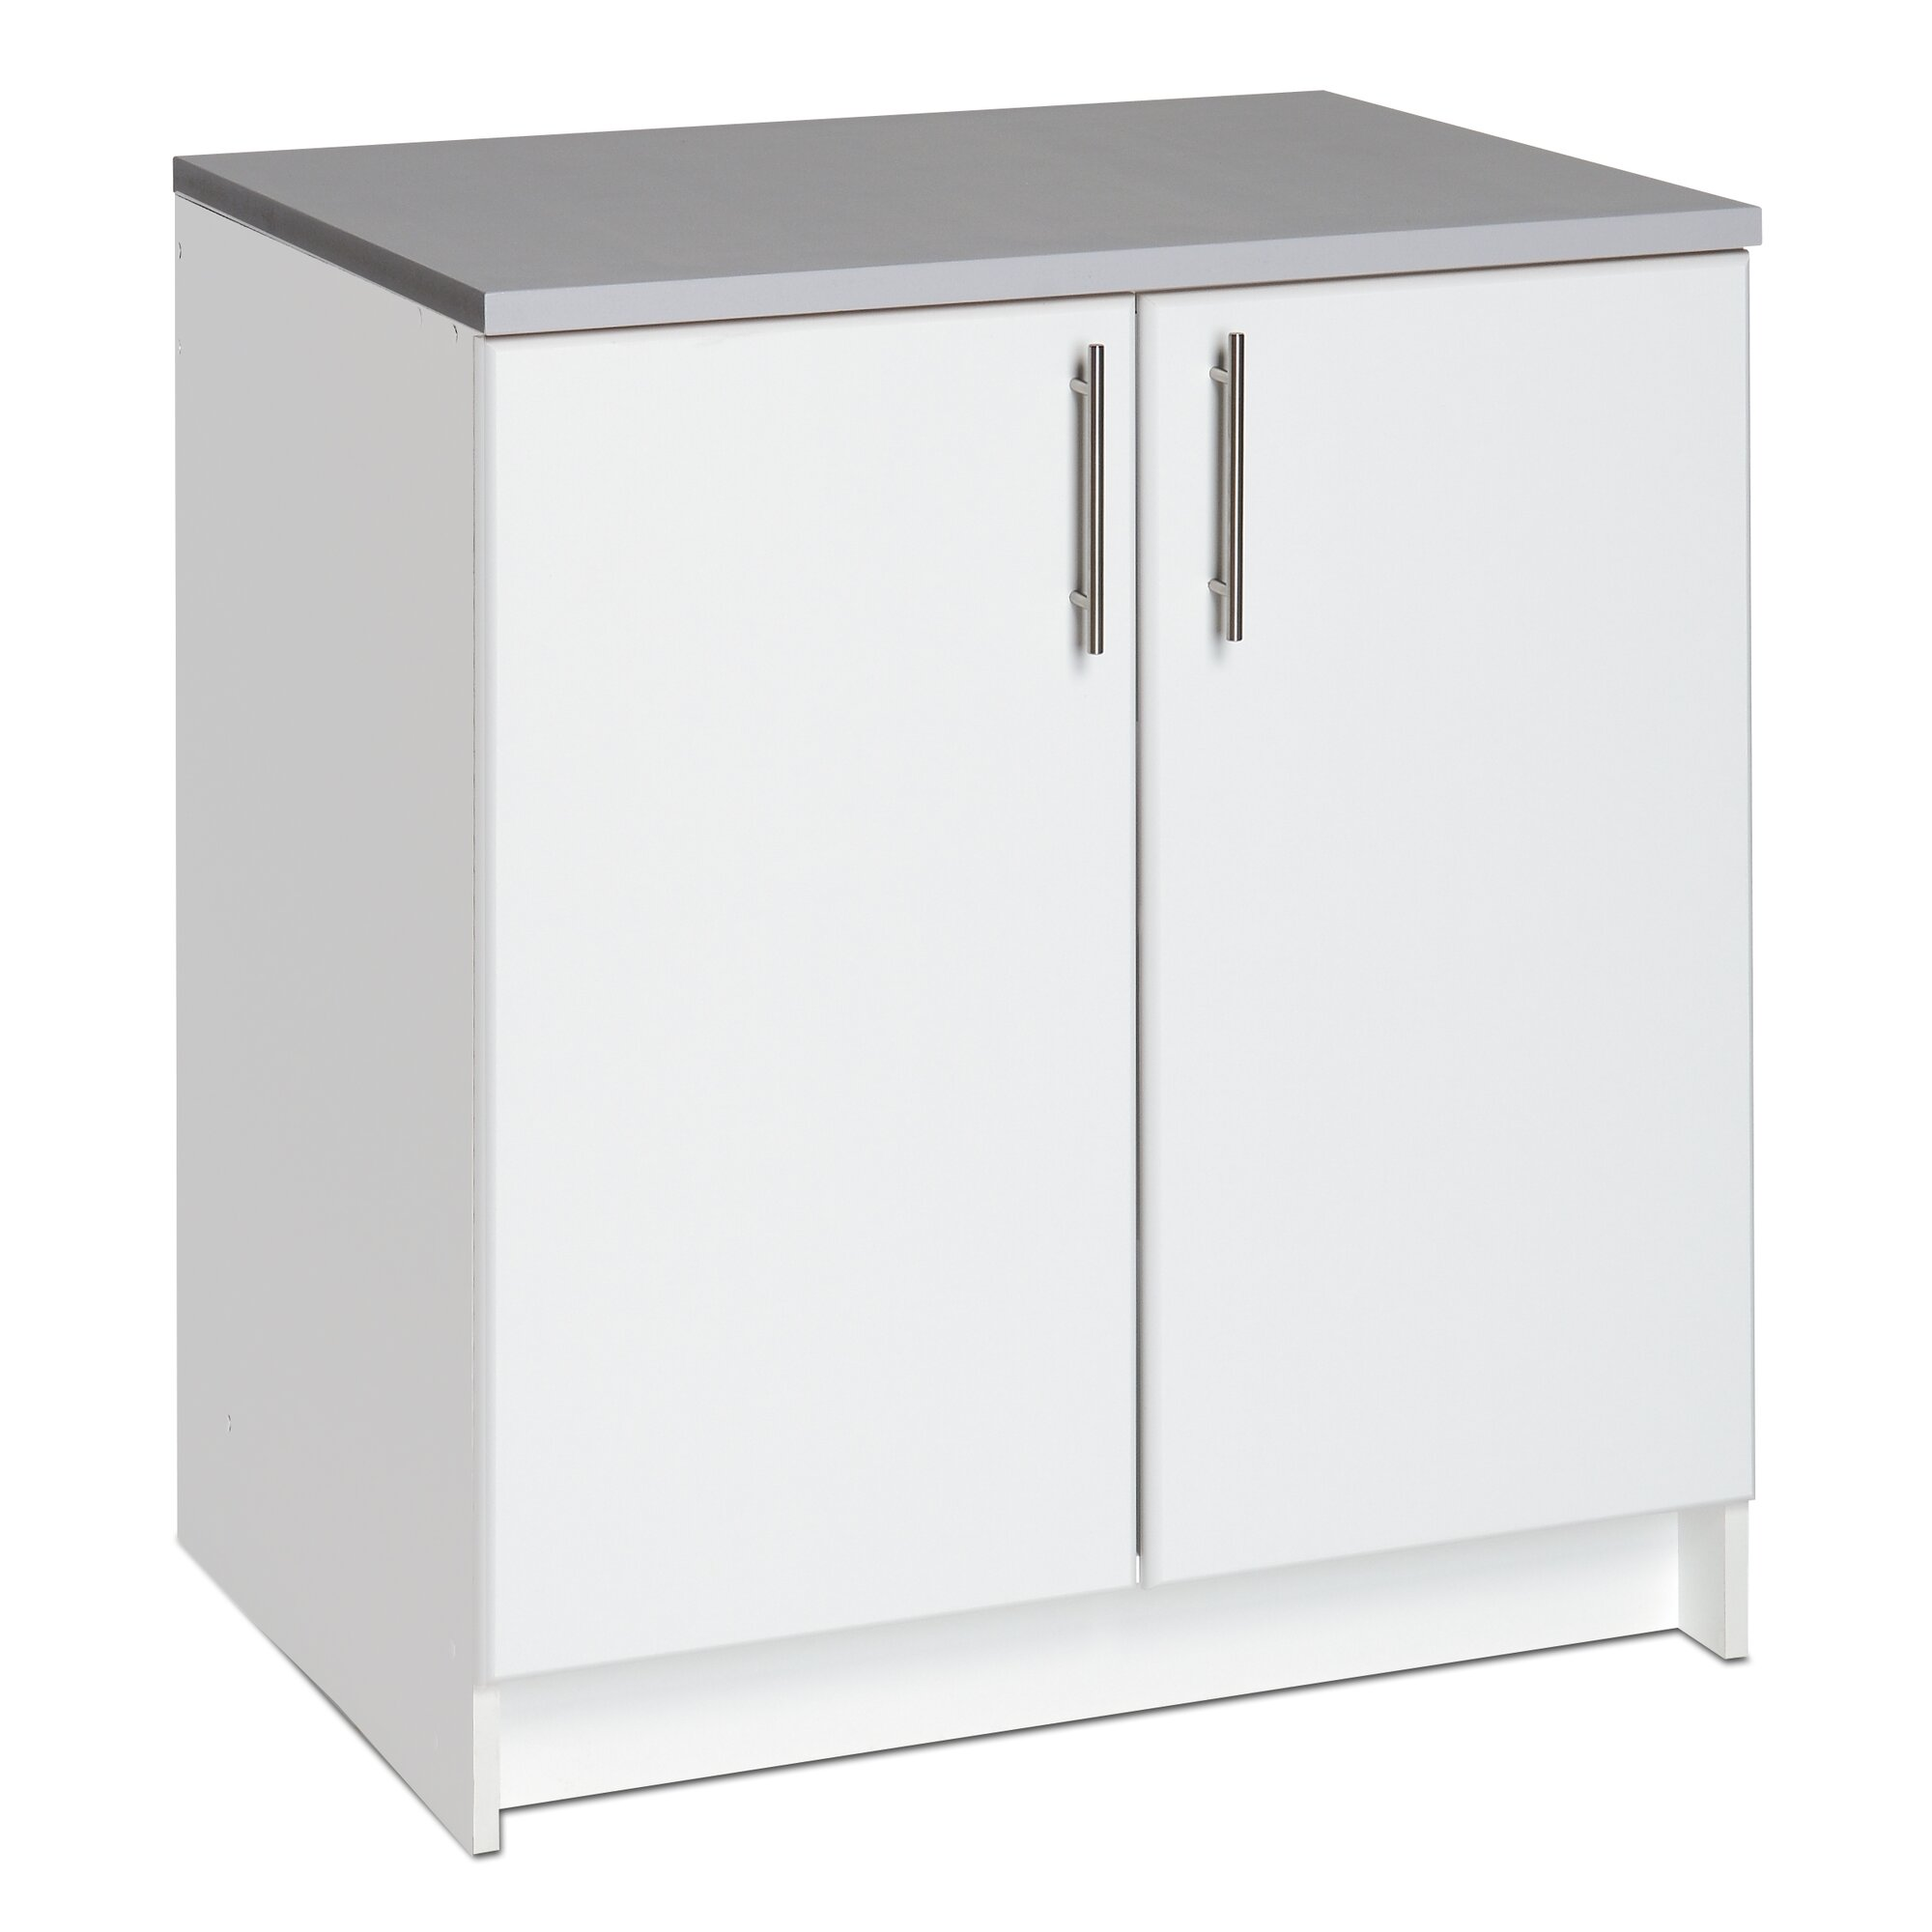 Wayfair basics wayfair basics 36 h x 32 w x 24 d white for Wayfair kitchen cabinets